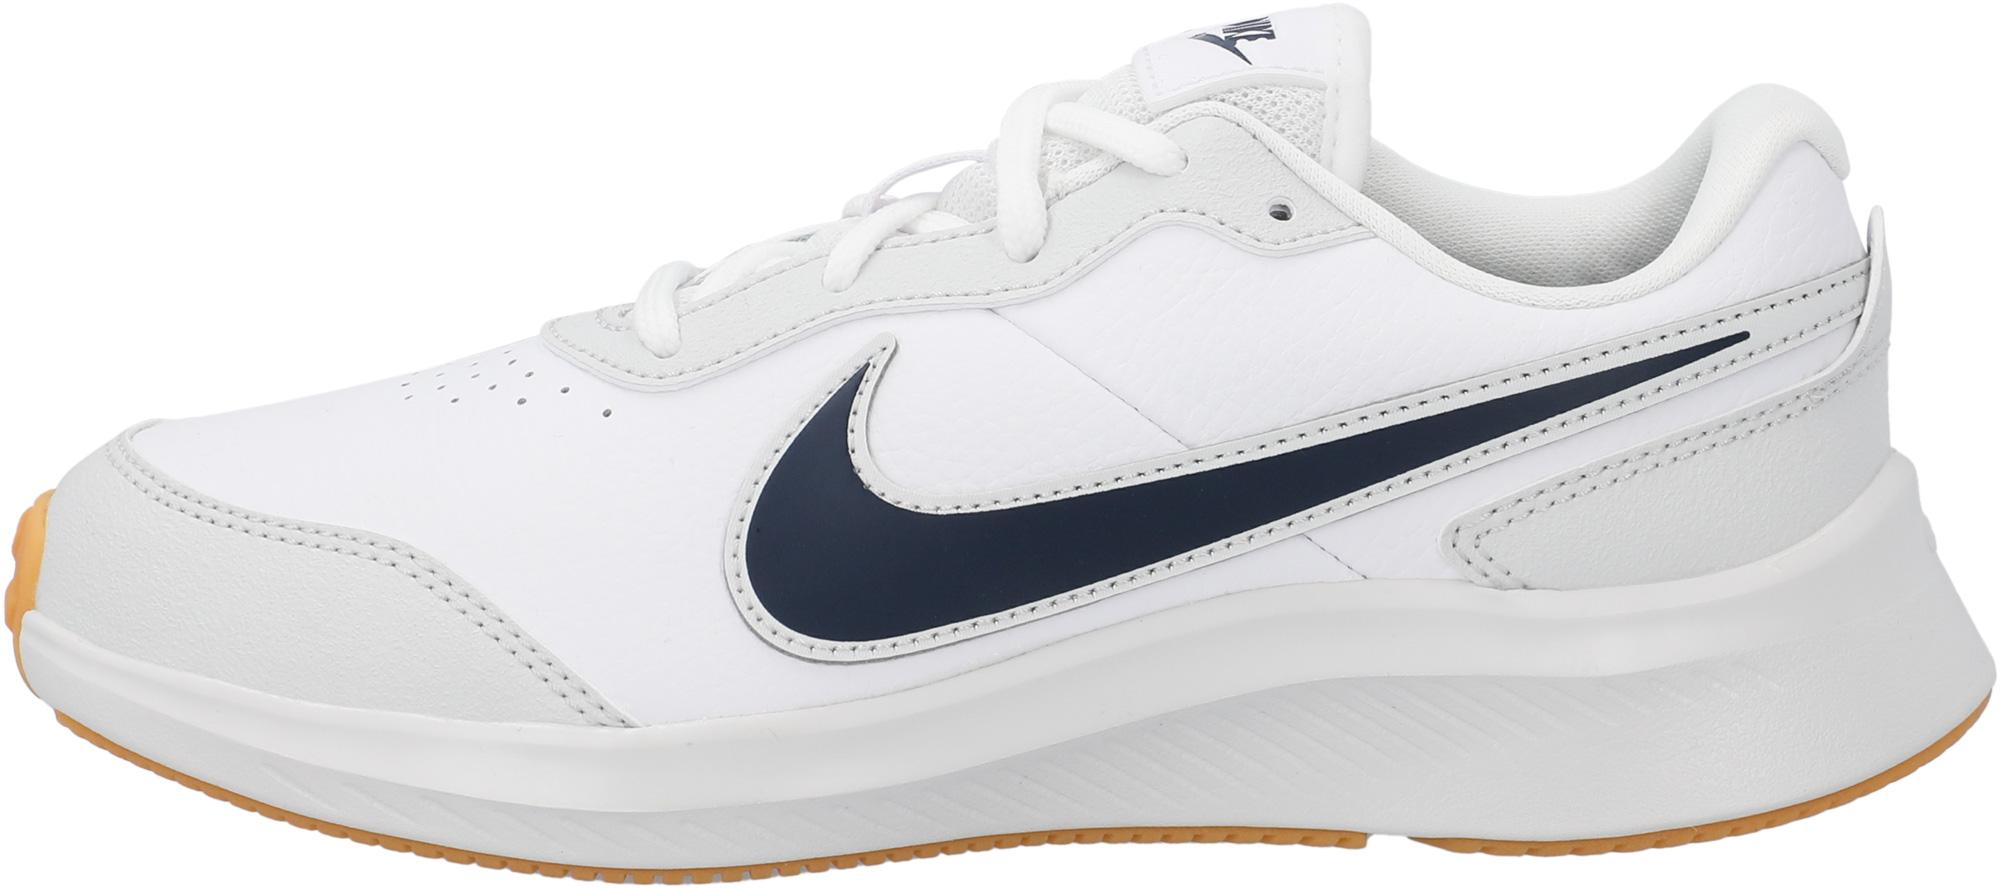 Nike Кроссовки для девочек Nike Varsity Leather (GS), размер 37.5 кроссовки nike cortez basic ltr se gs shoe girls aa3043 001